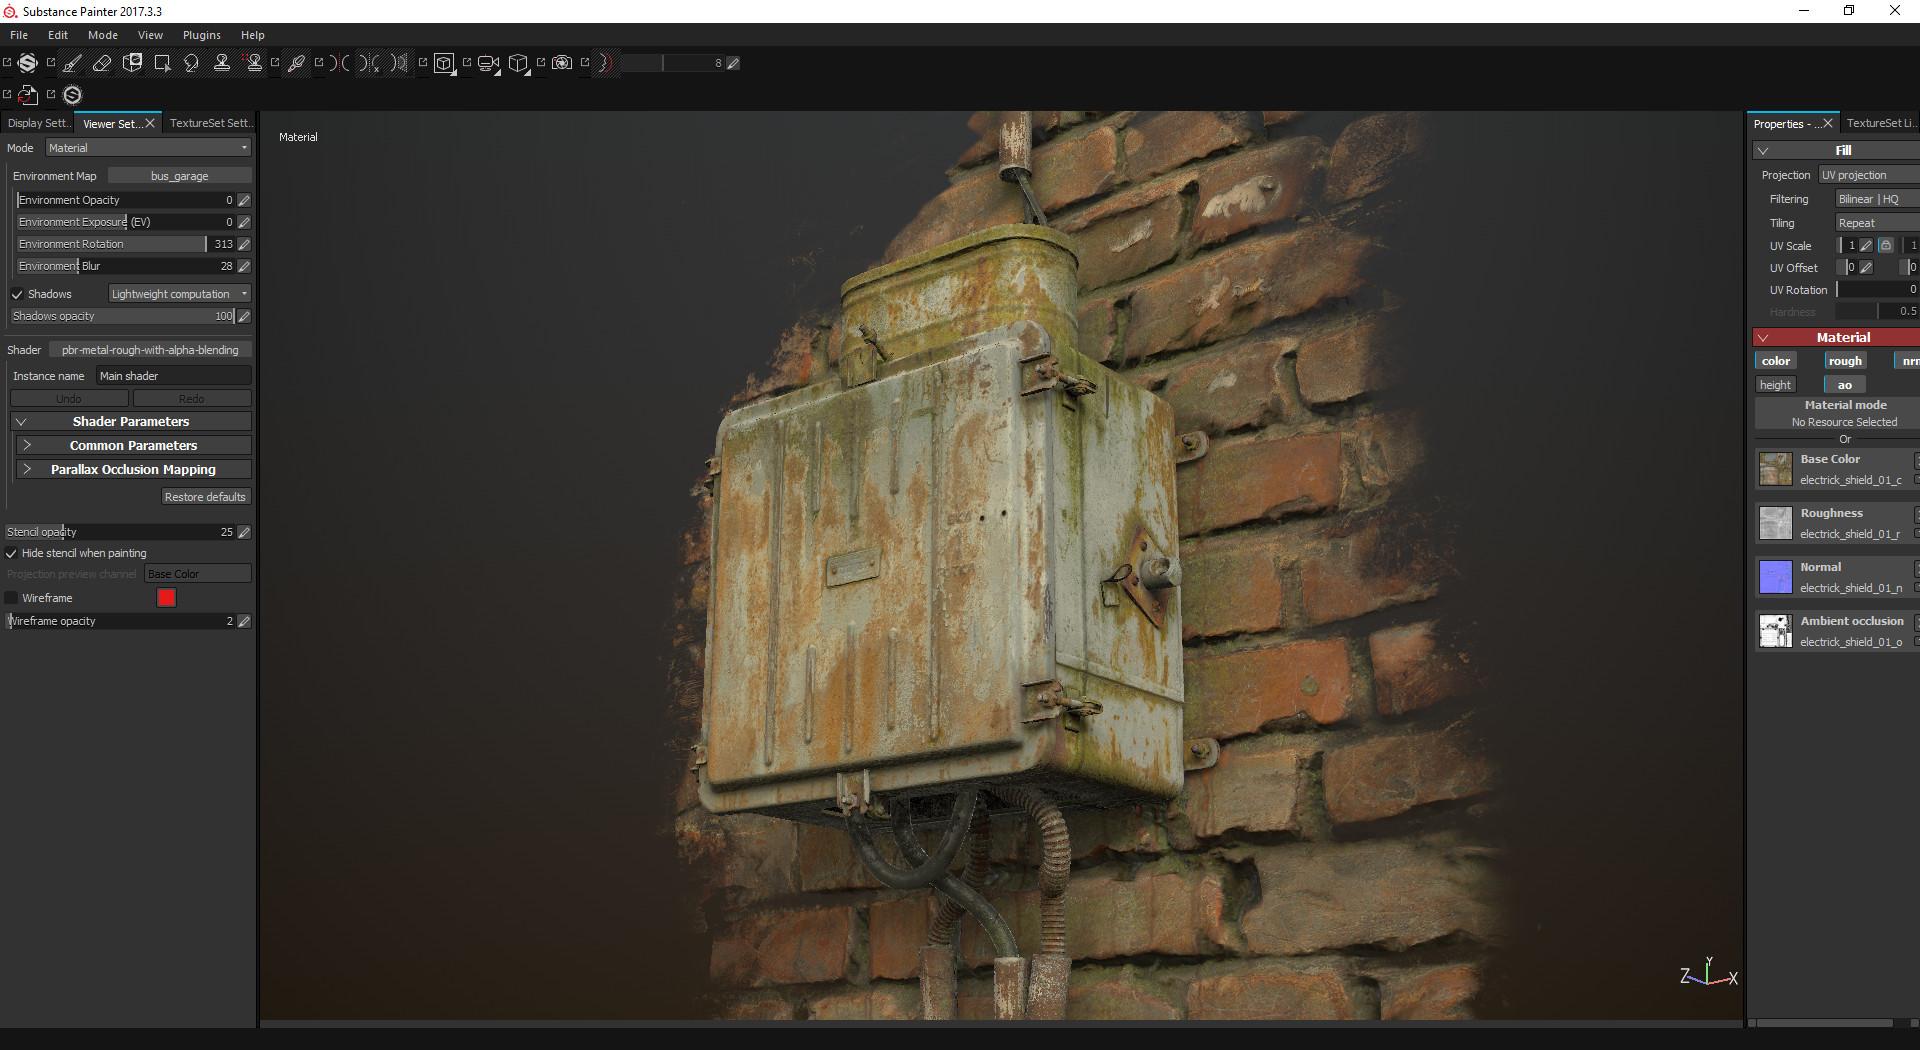 fuse box texture [ 1920 x 1050 Pixel ]